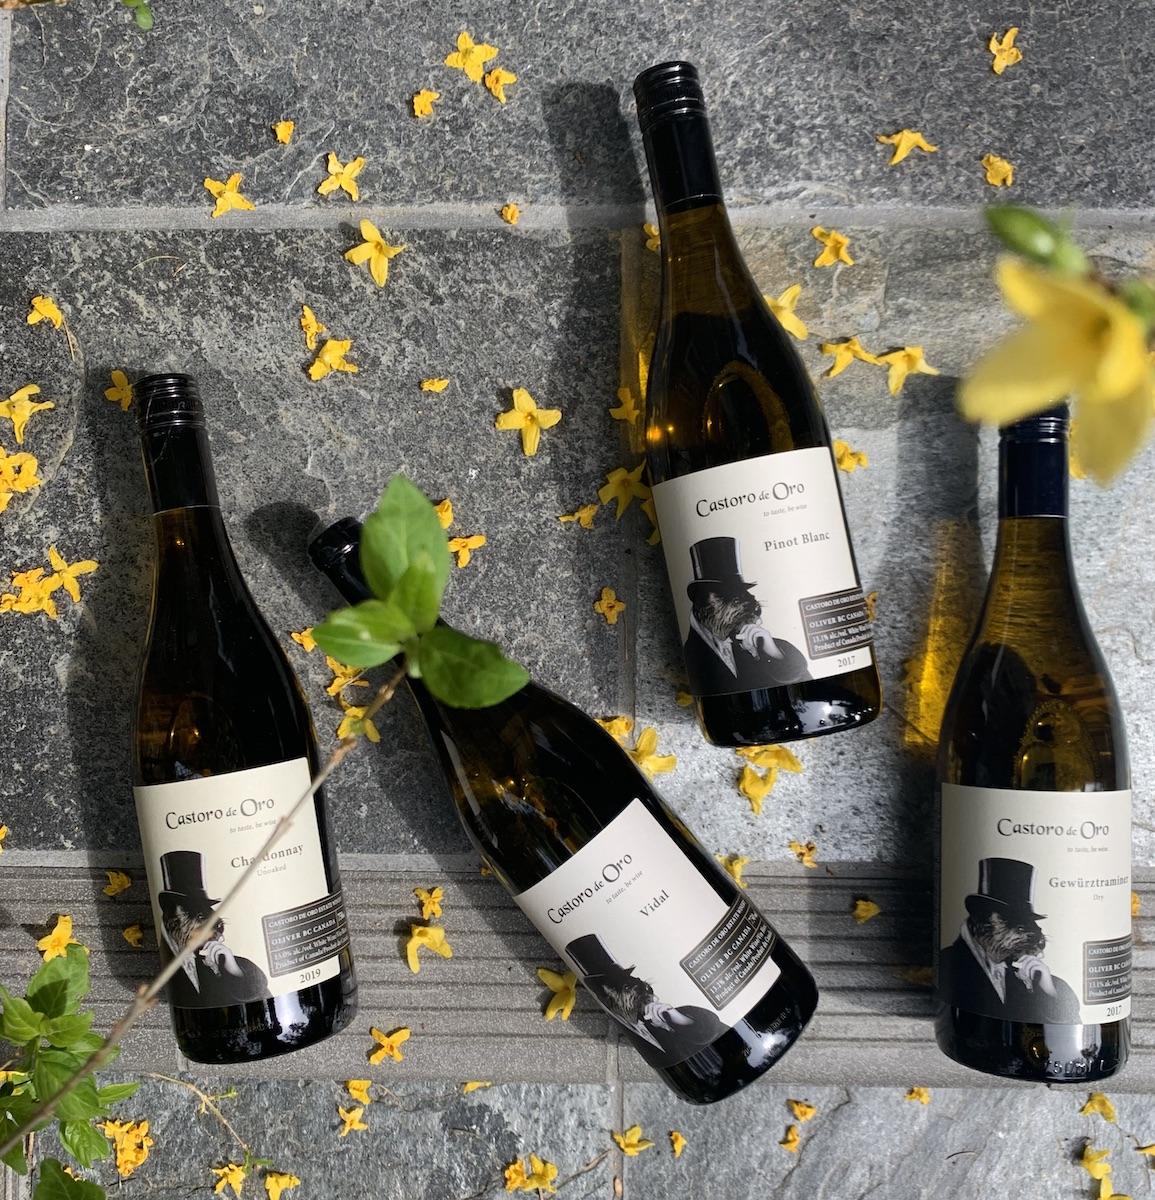 #ShiptoSip 2021 with Castoro de Oro Winery